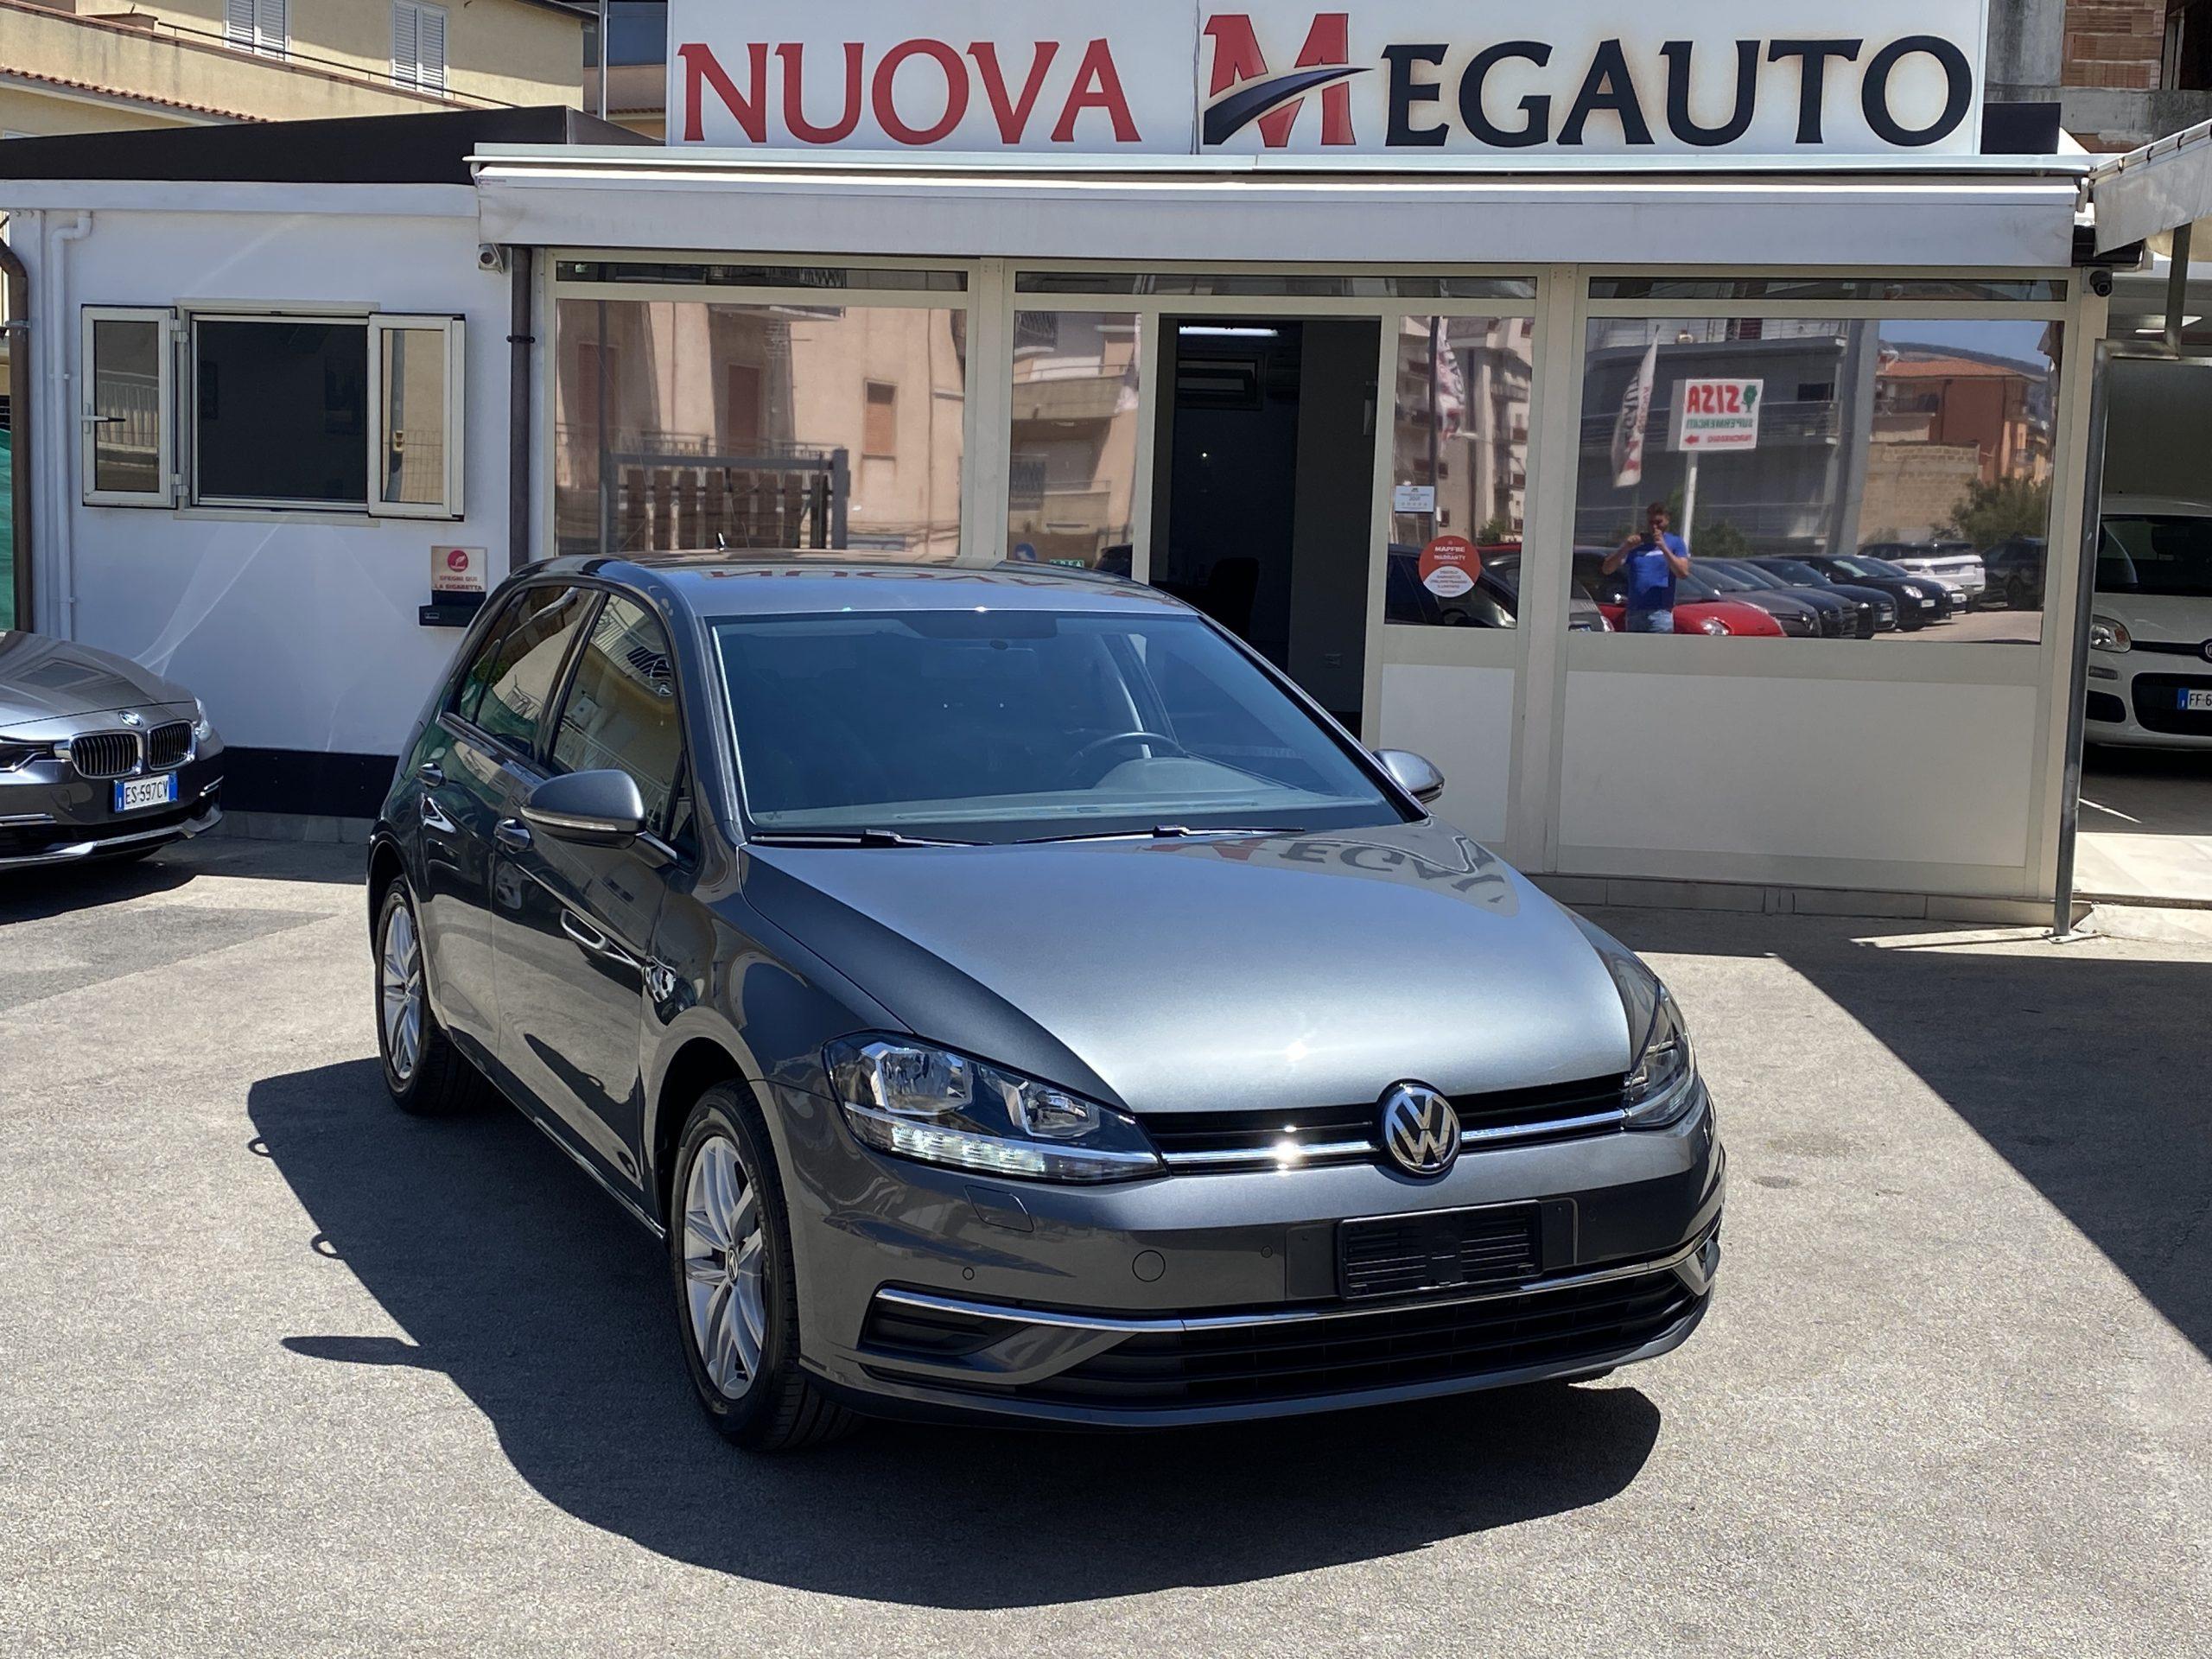 Volkswagen Golf 2.0 TDI 5p. Highline BlueMotion Technology